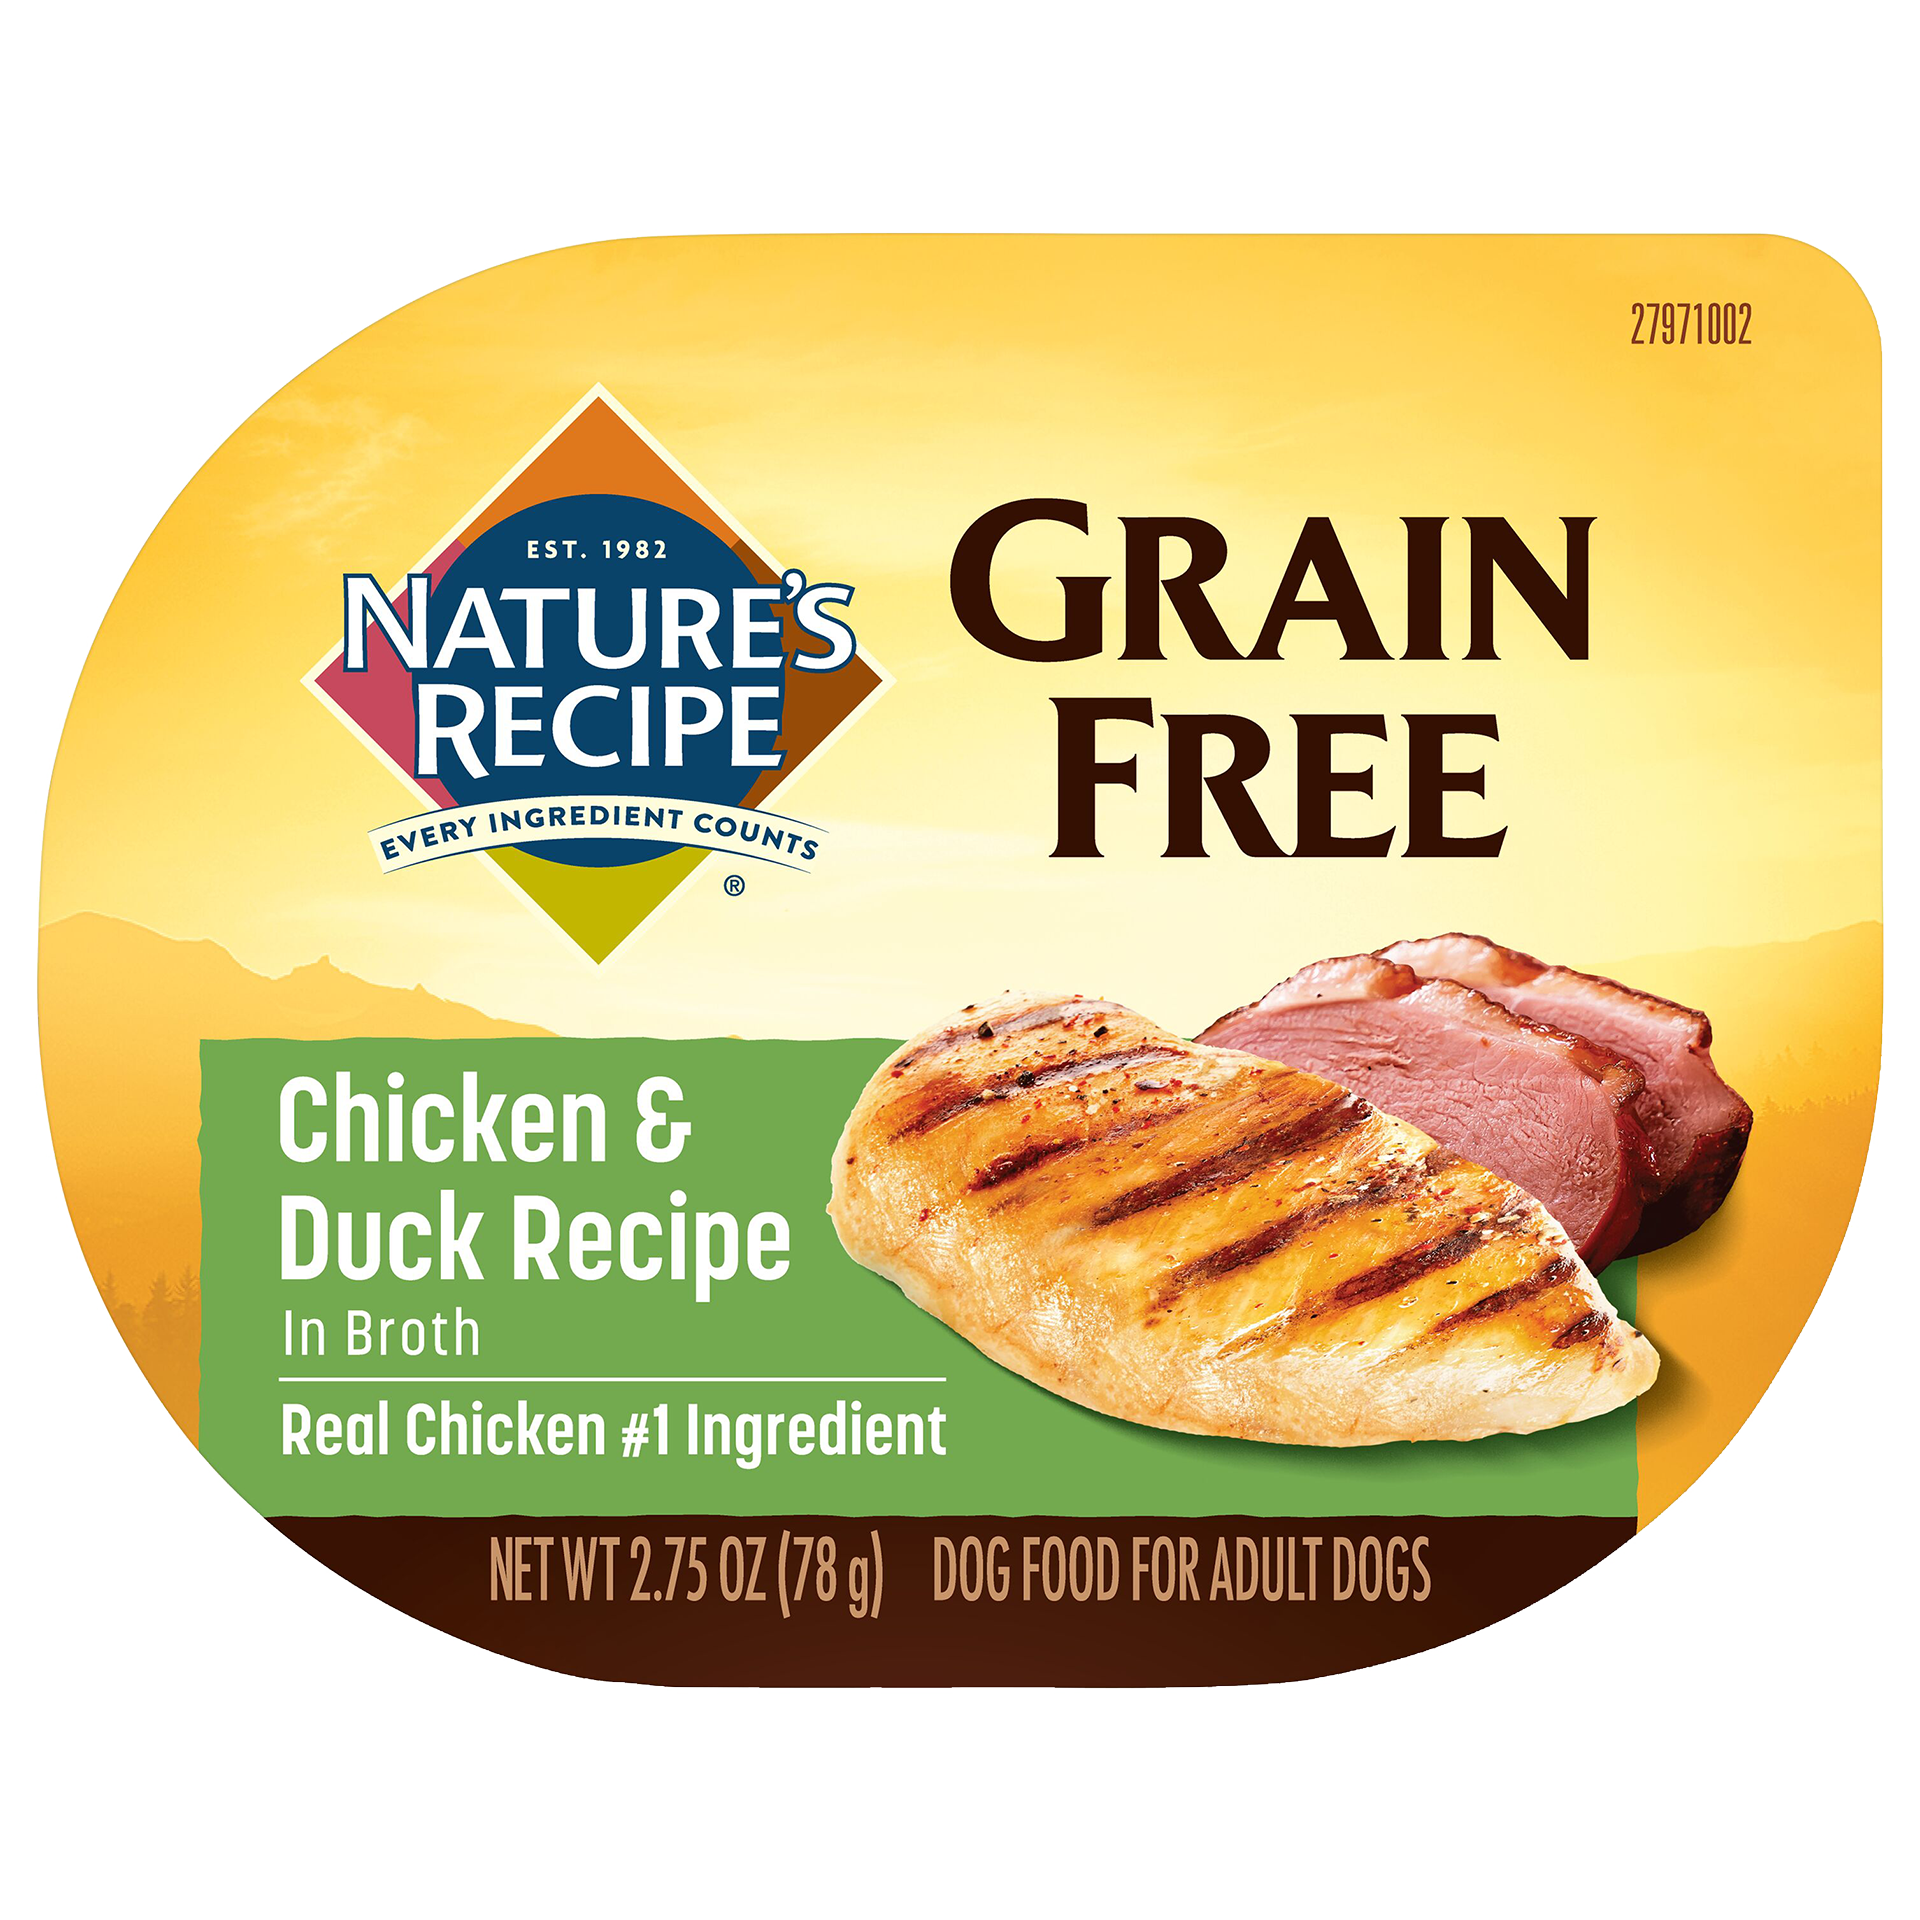 Chicken & Duck Recipe in Broth